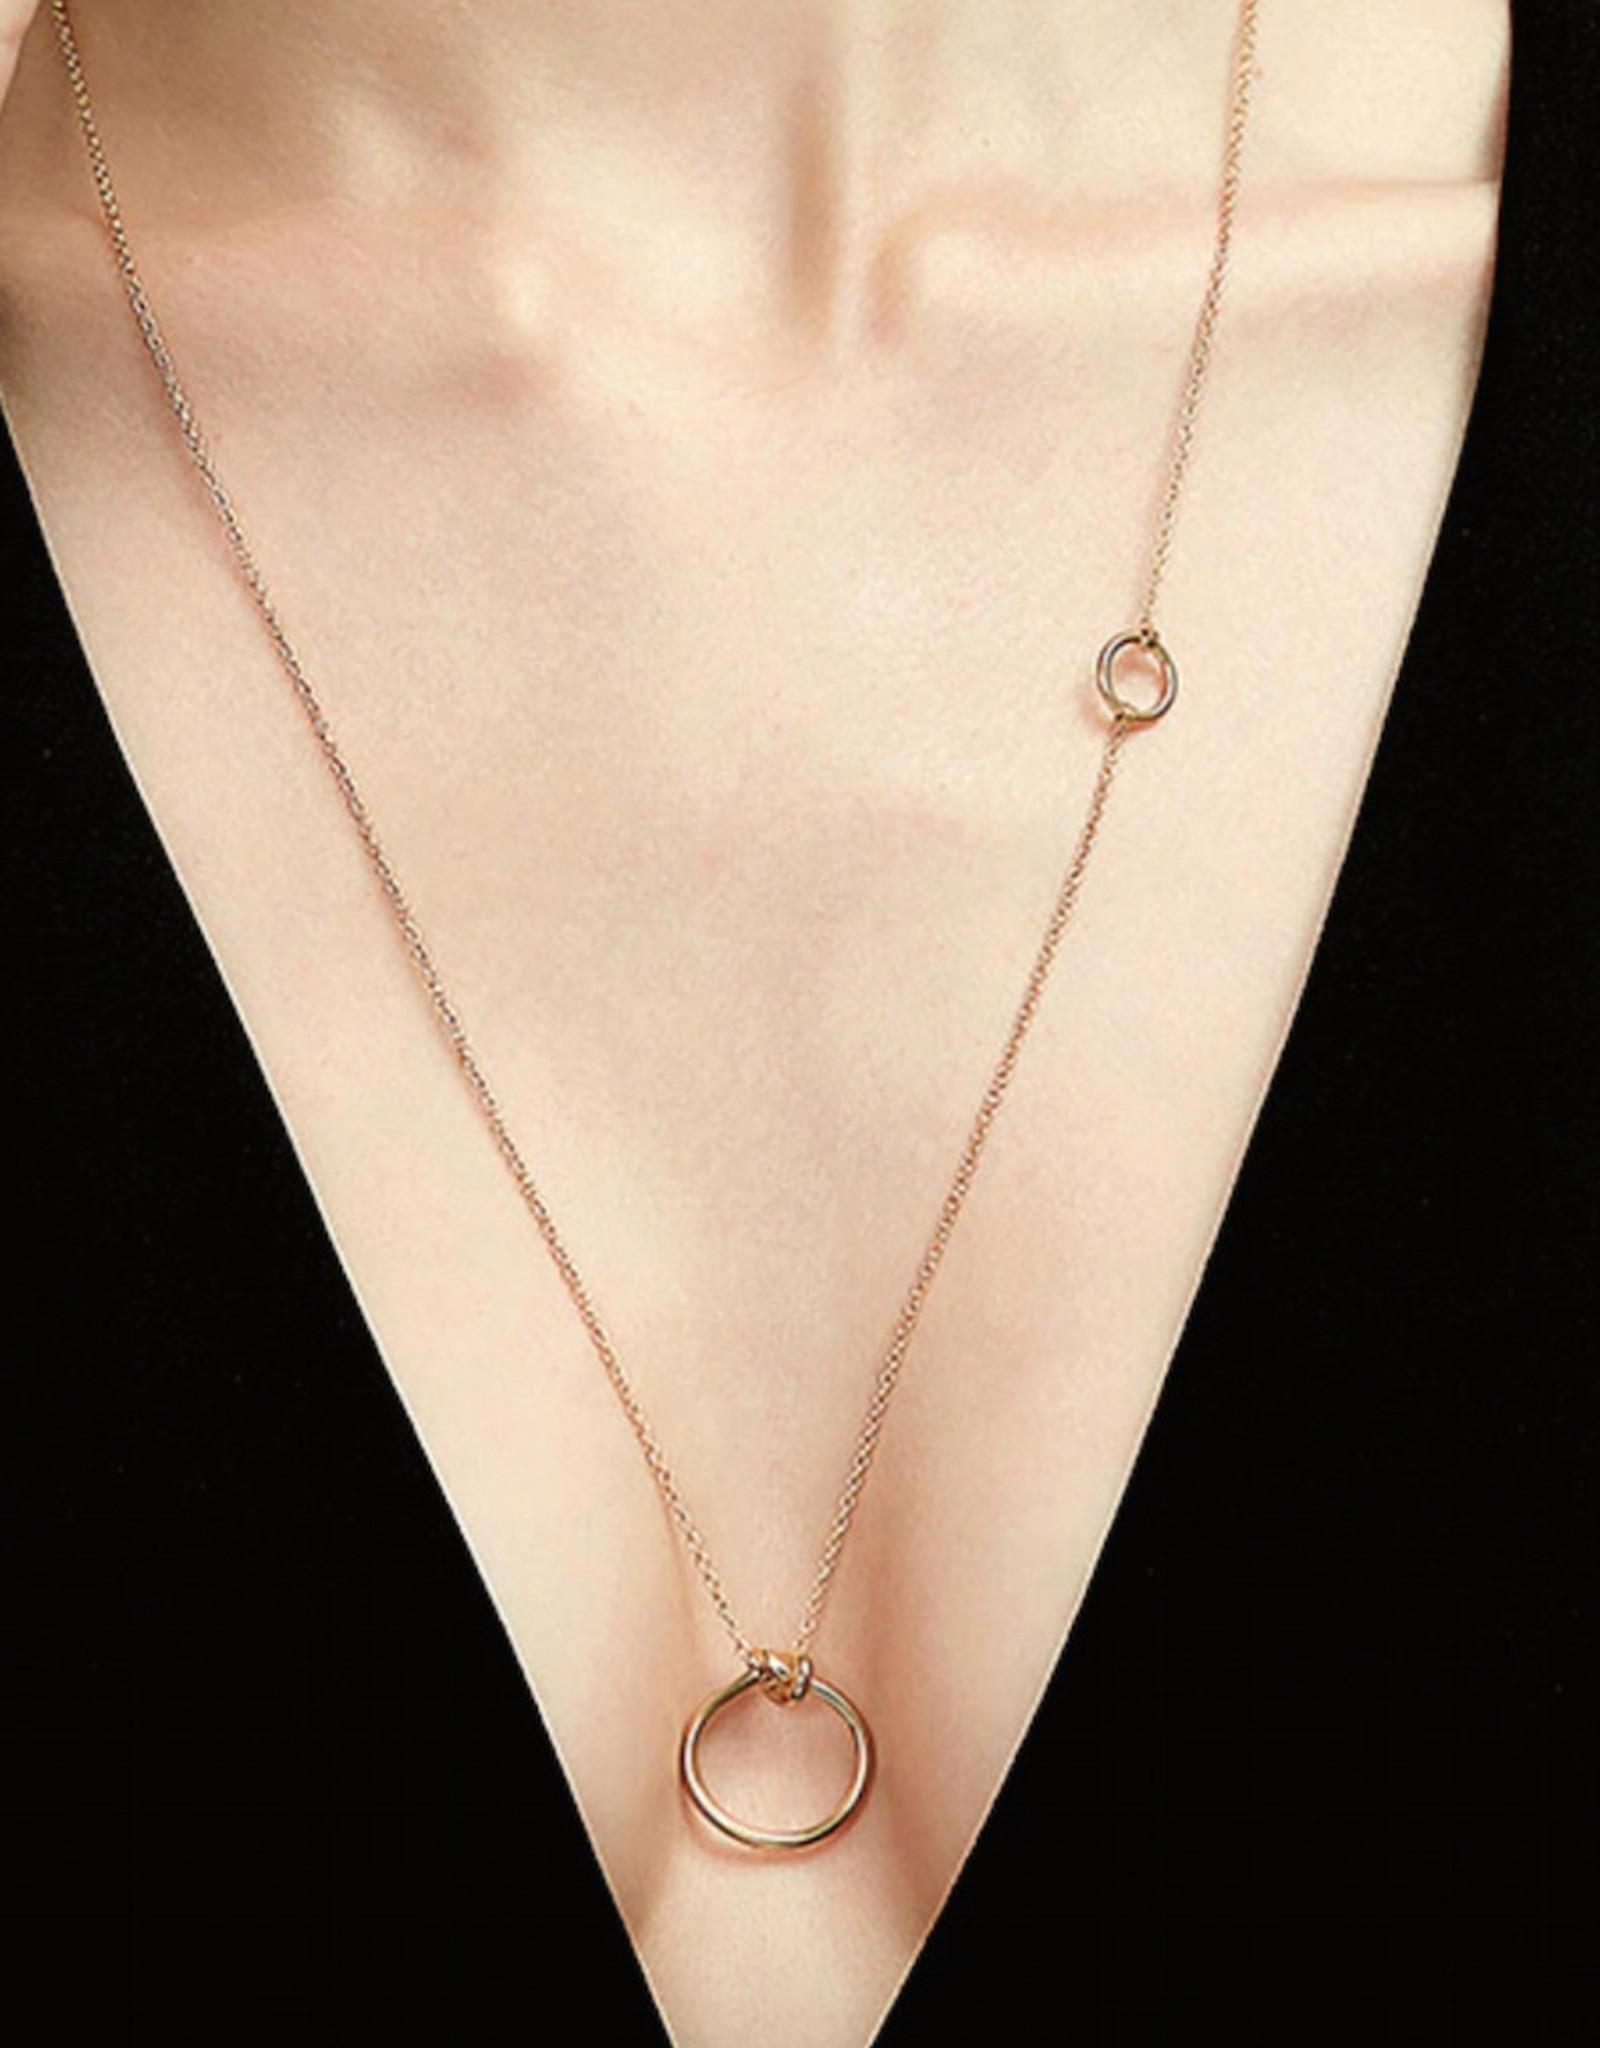 Lakoo Designs Gold Adjustable Necklace